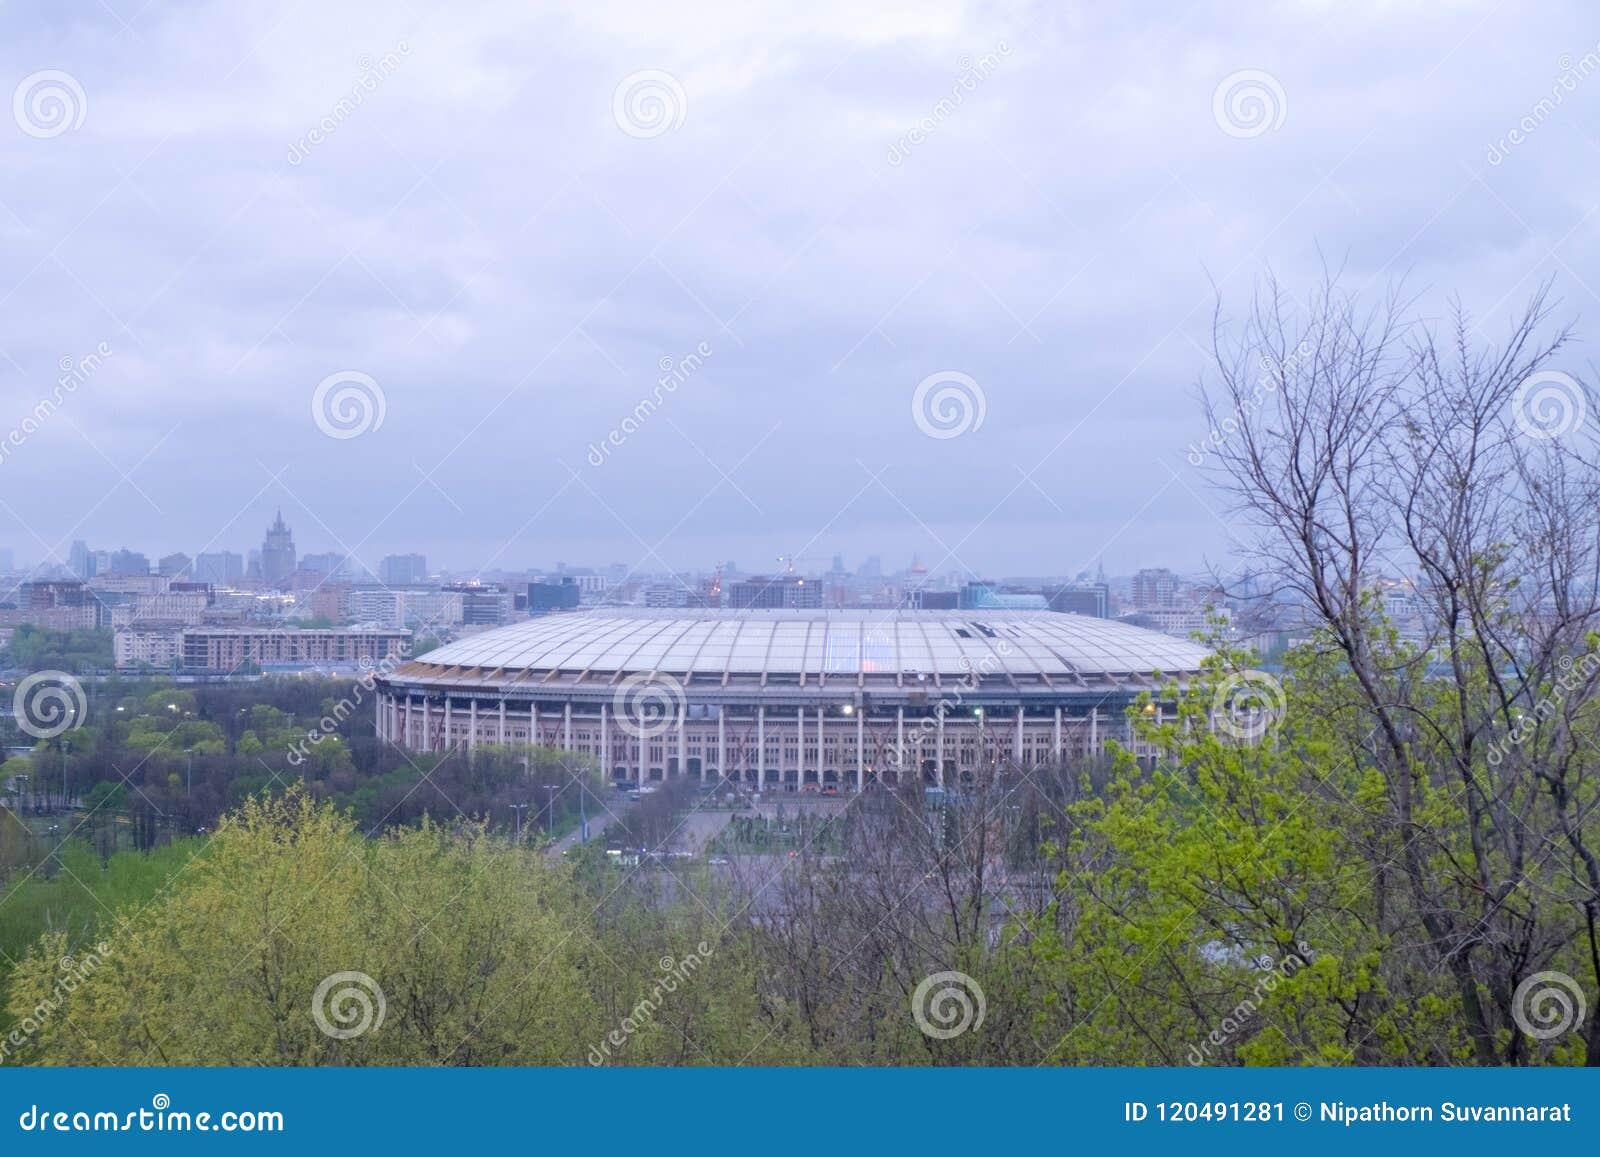 Ansicht vom Olympiastadion Luzhniki in Moskau, Russland